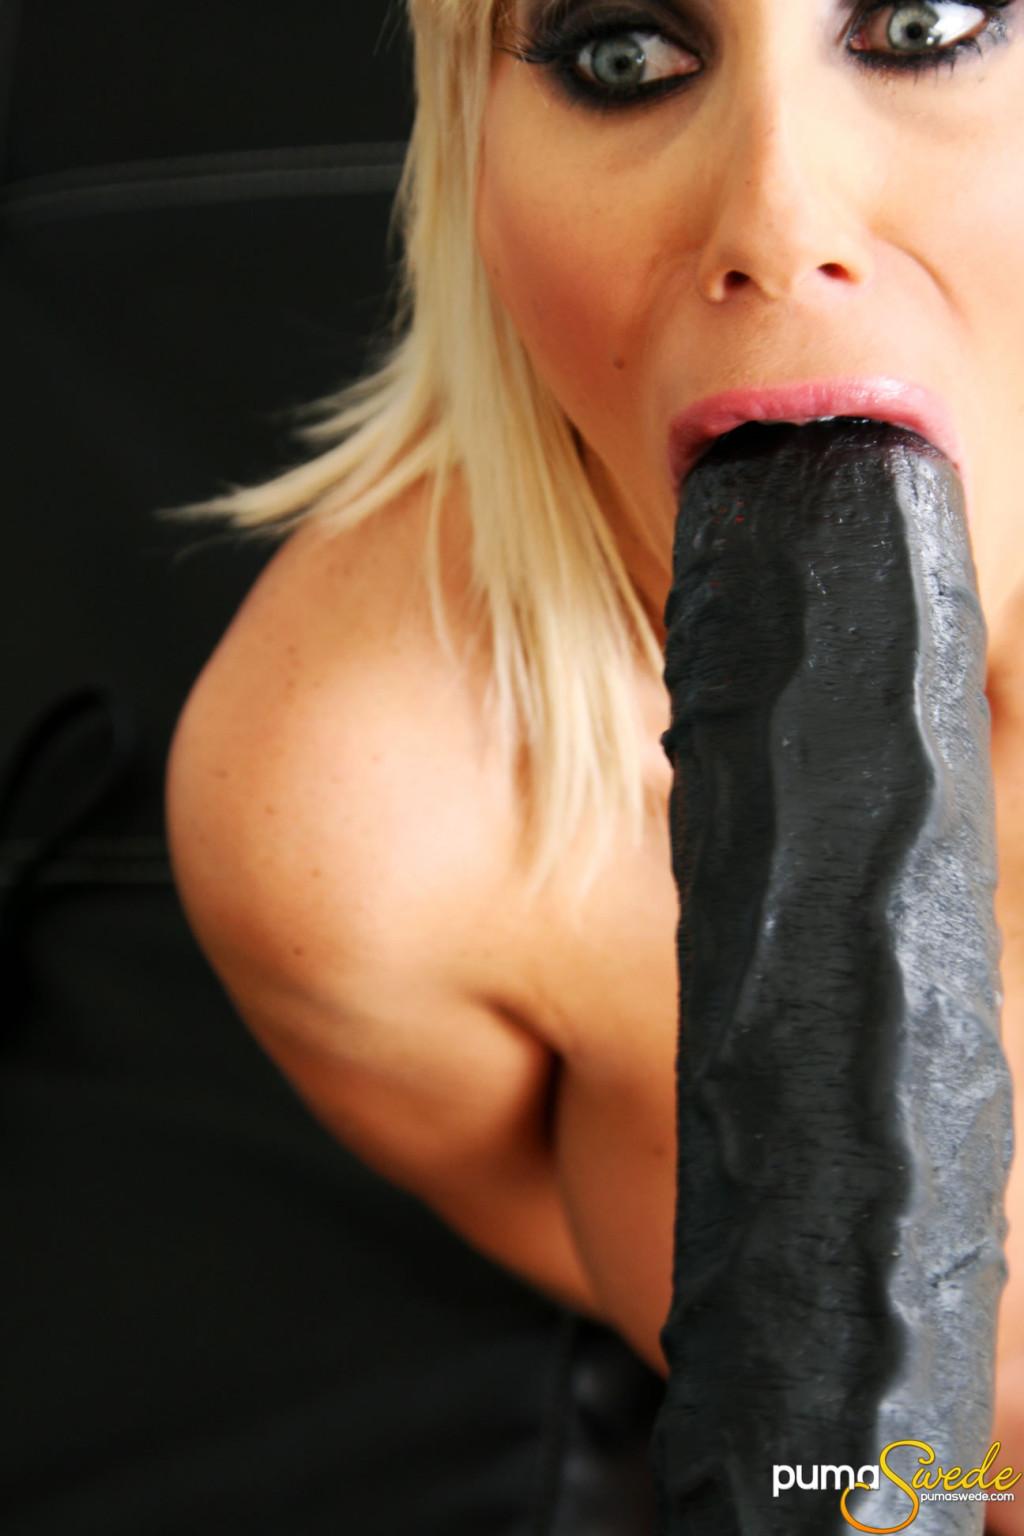 Porn twink teeen boi experienceamsterdam